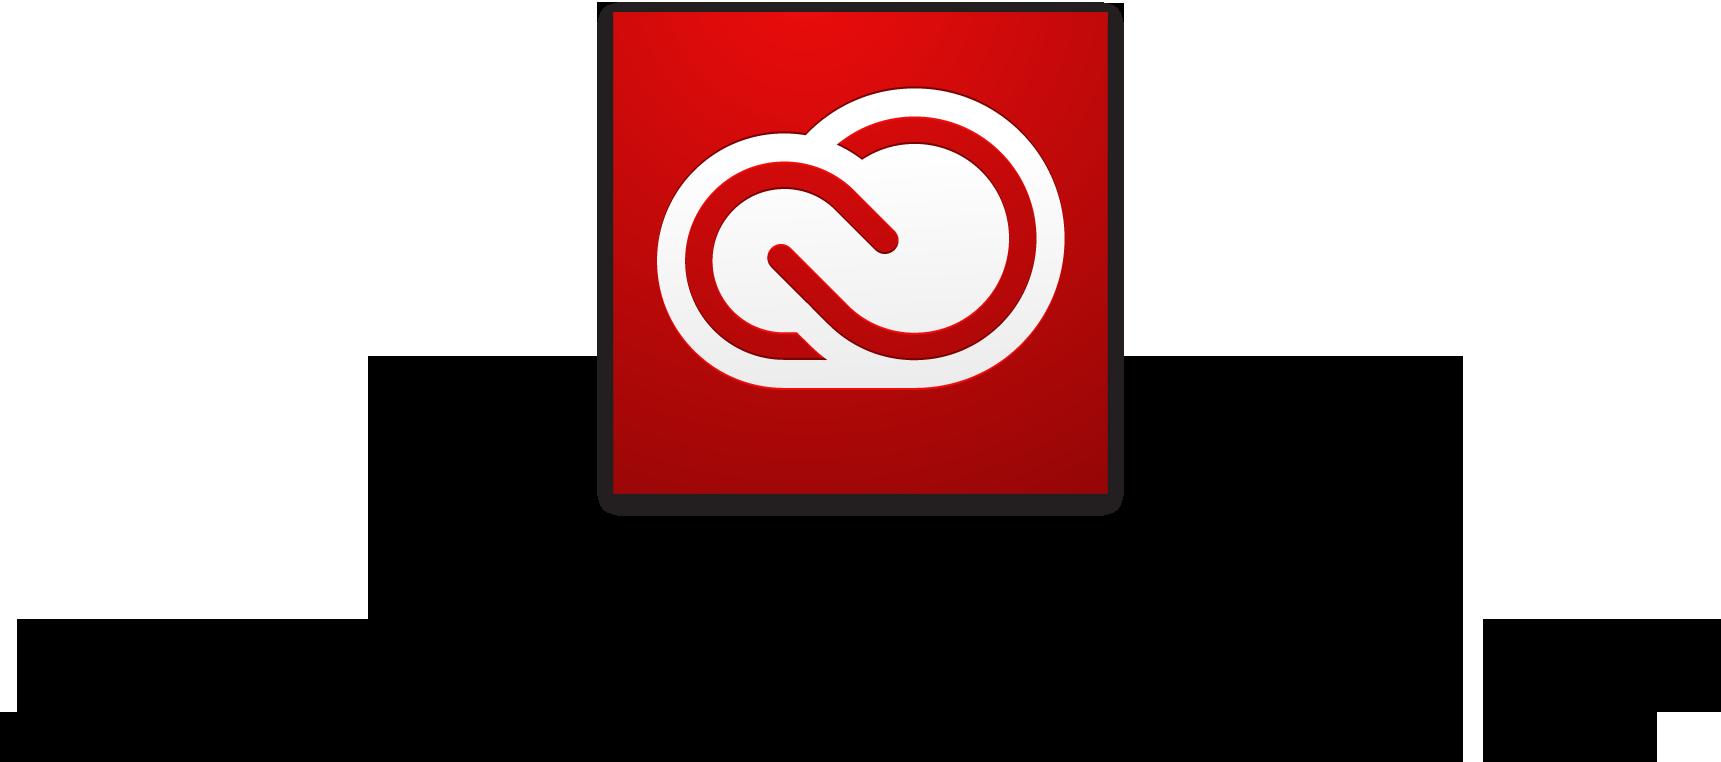 adobe creative cloud cc logo #1895